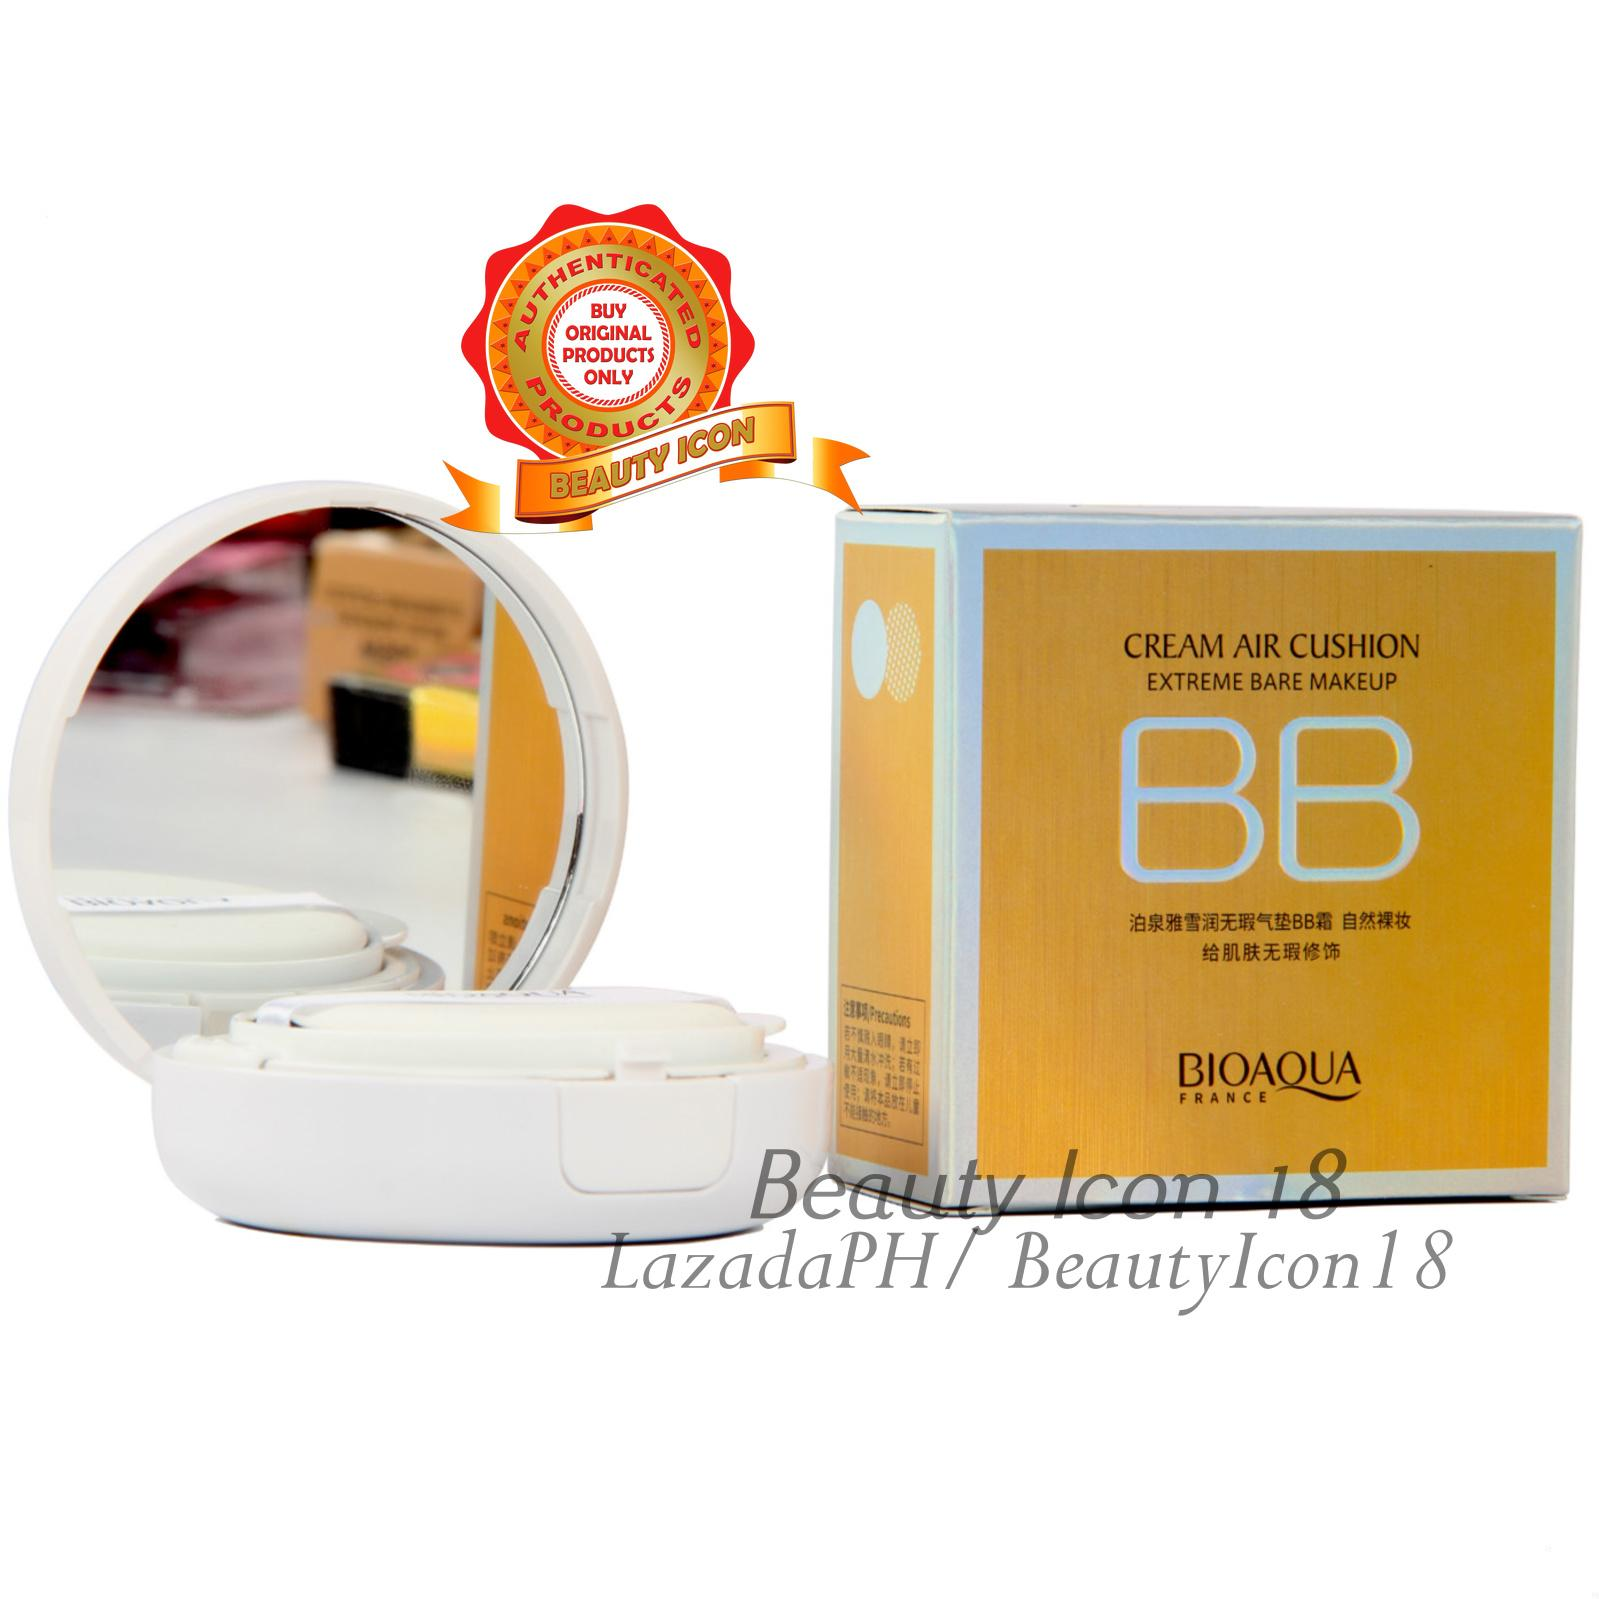 Discount Bioaqua Bqy4891 5 Light And Shiny Air Cushion Cream 15g Bio Aqua Aircusion Sunscreen Concealer Moisturizing Foundation Natural Color